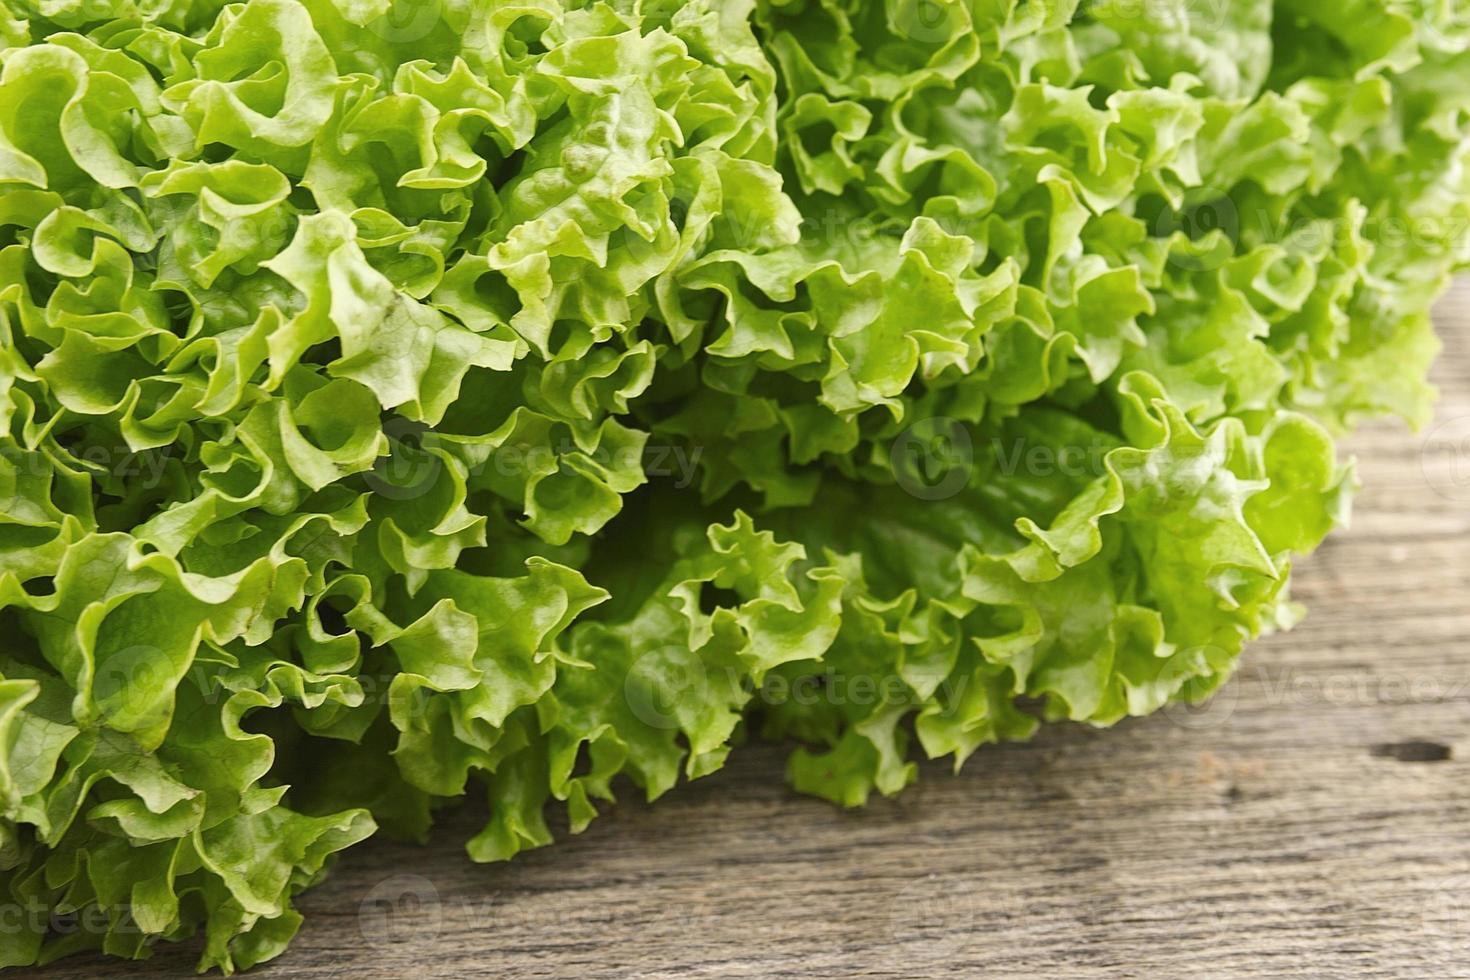 verse groene sla salat op houten achtergrond. gezond eten foto